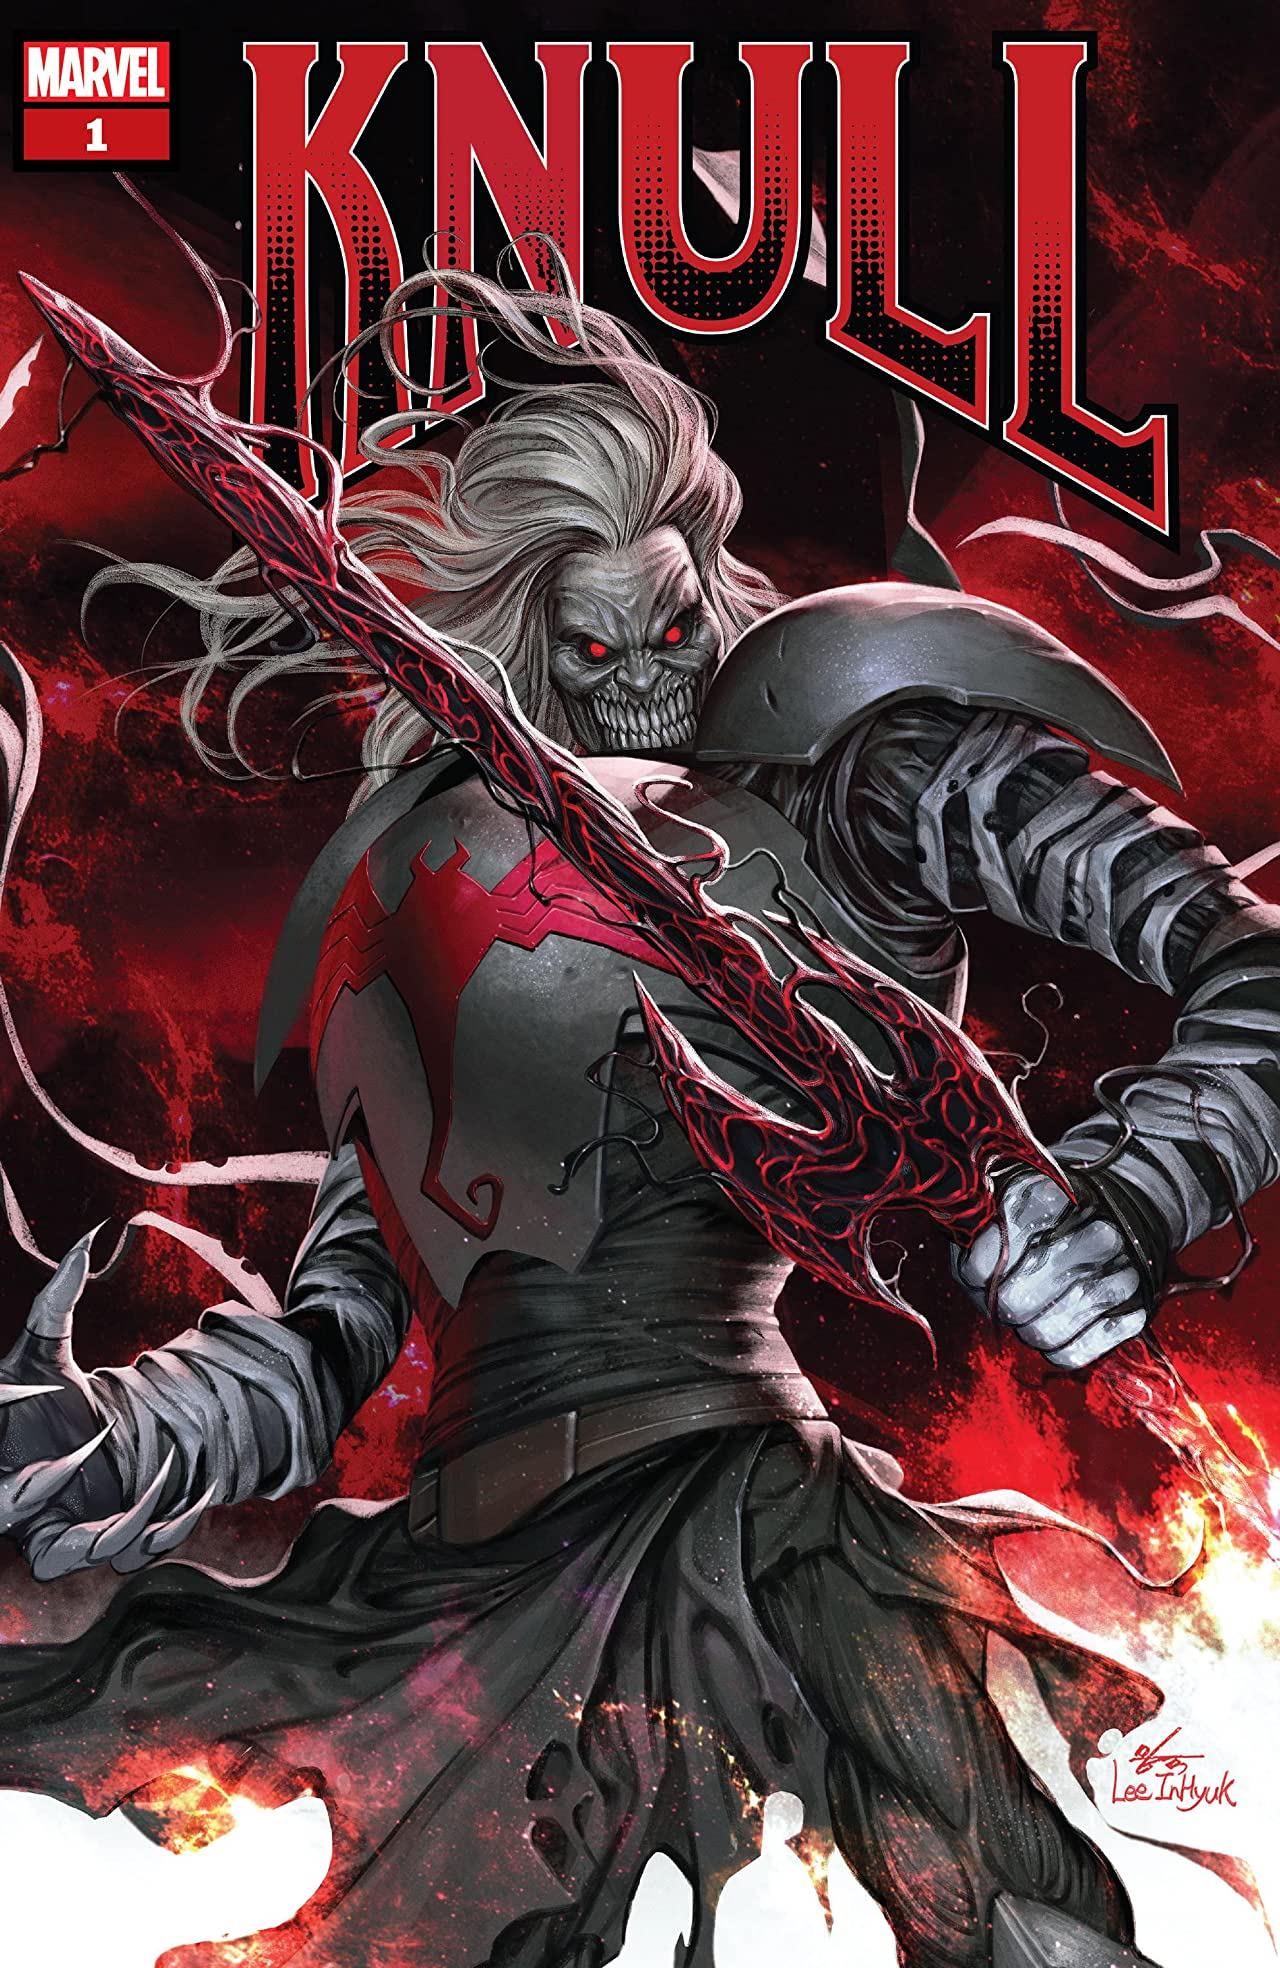 Knull: Marvel Tales Vol 1 1